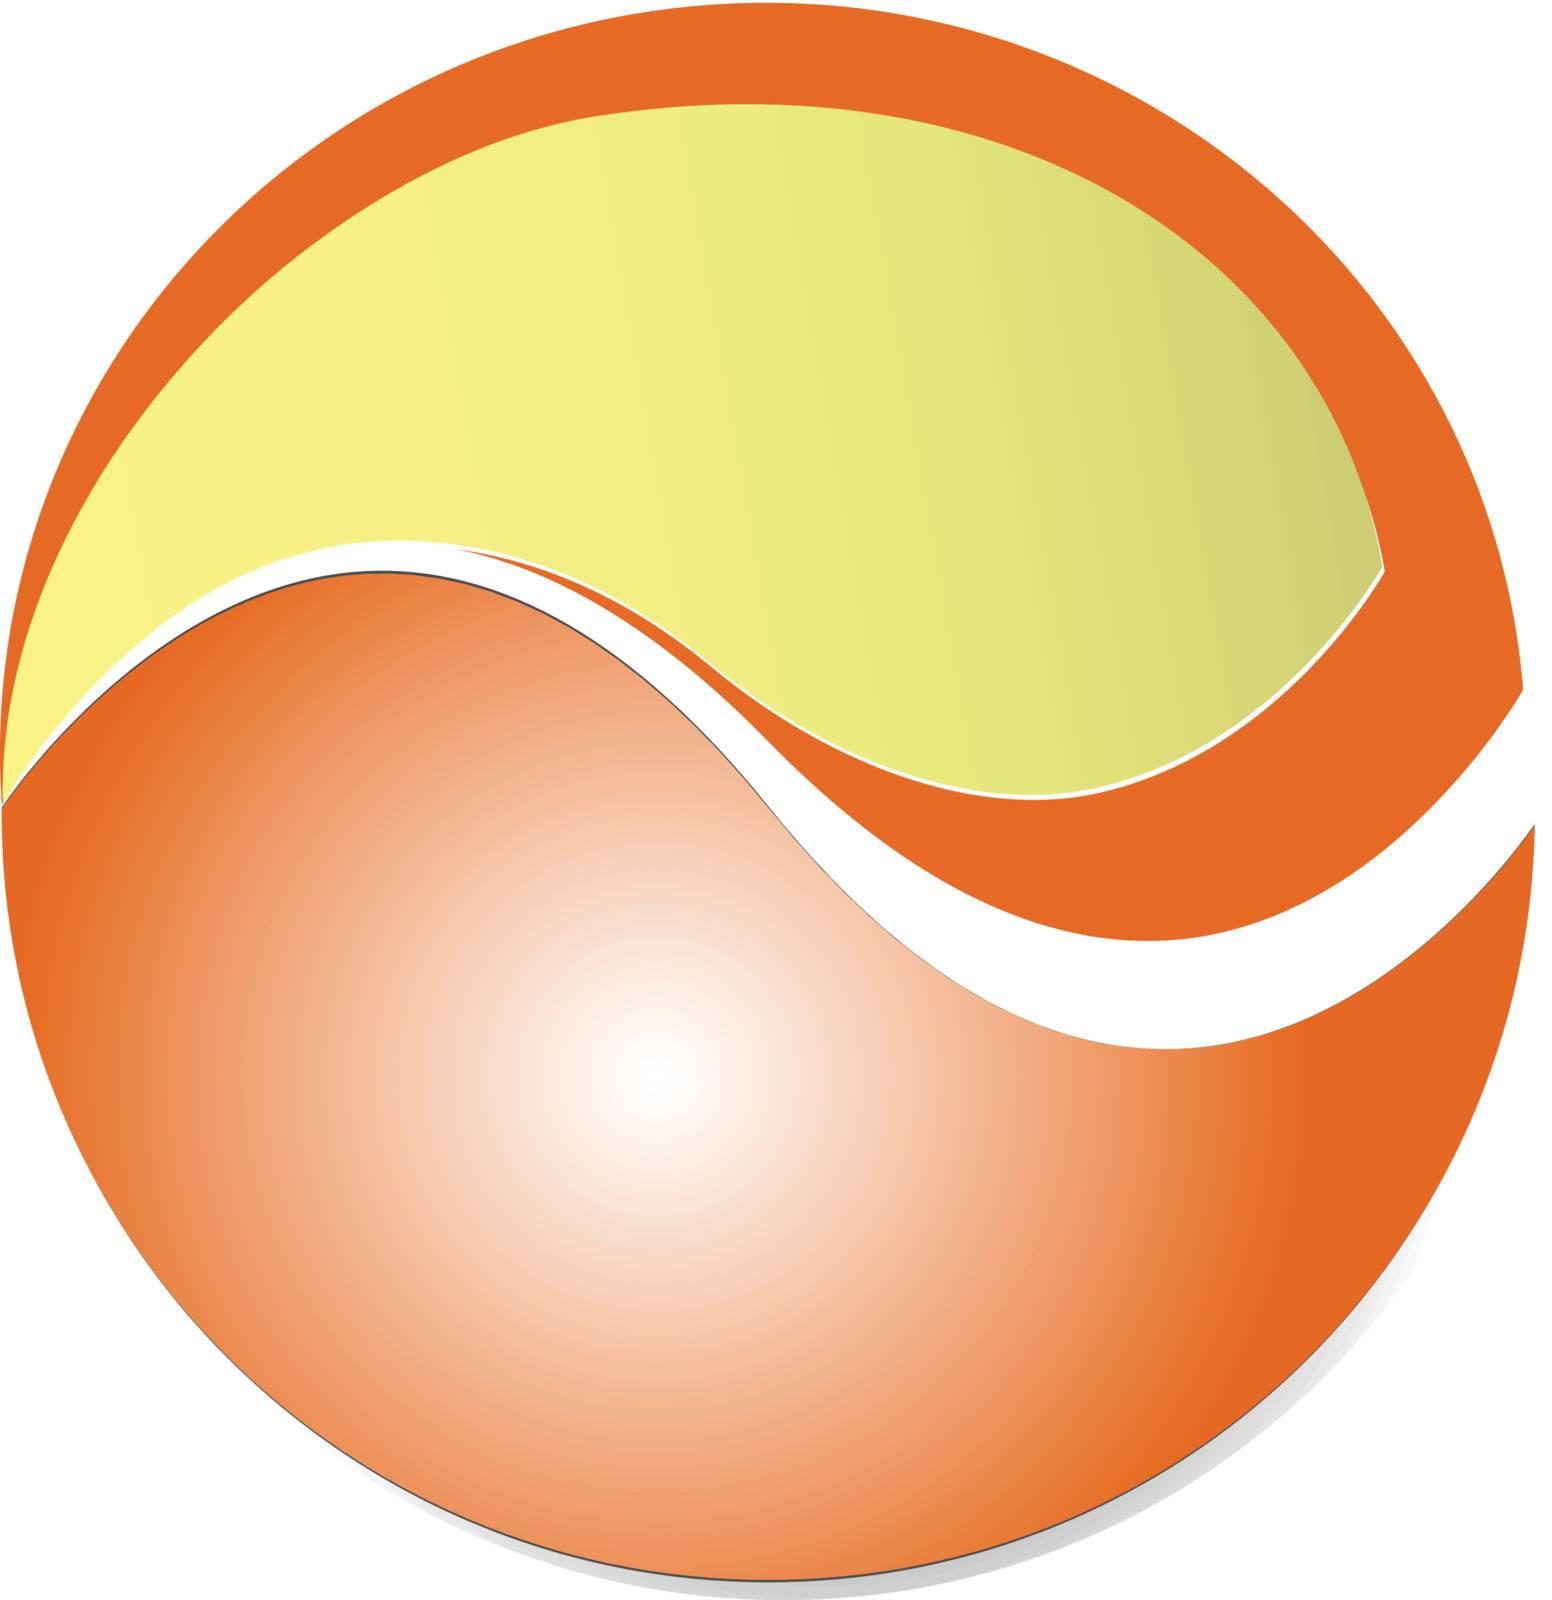 Logo, design element - orange circle, good for your business logo.